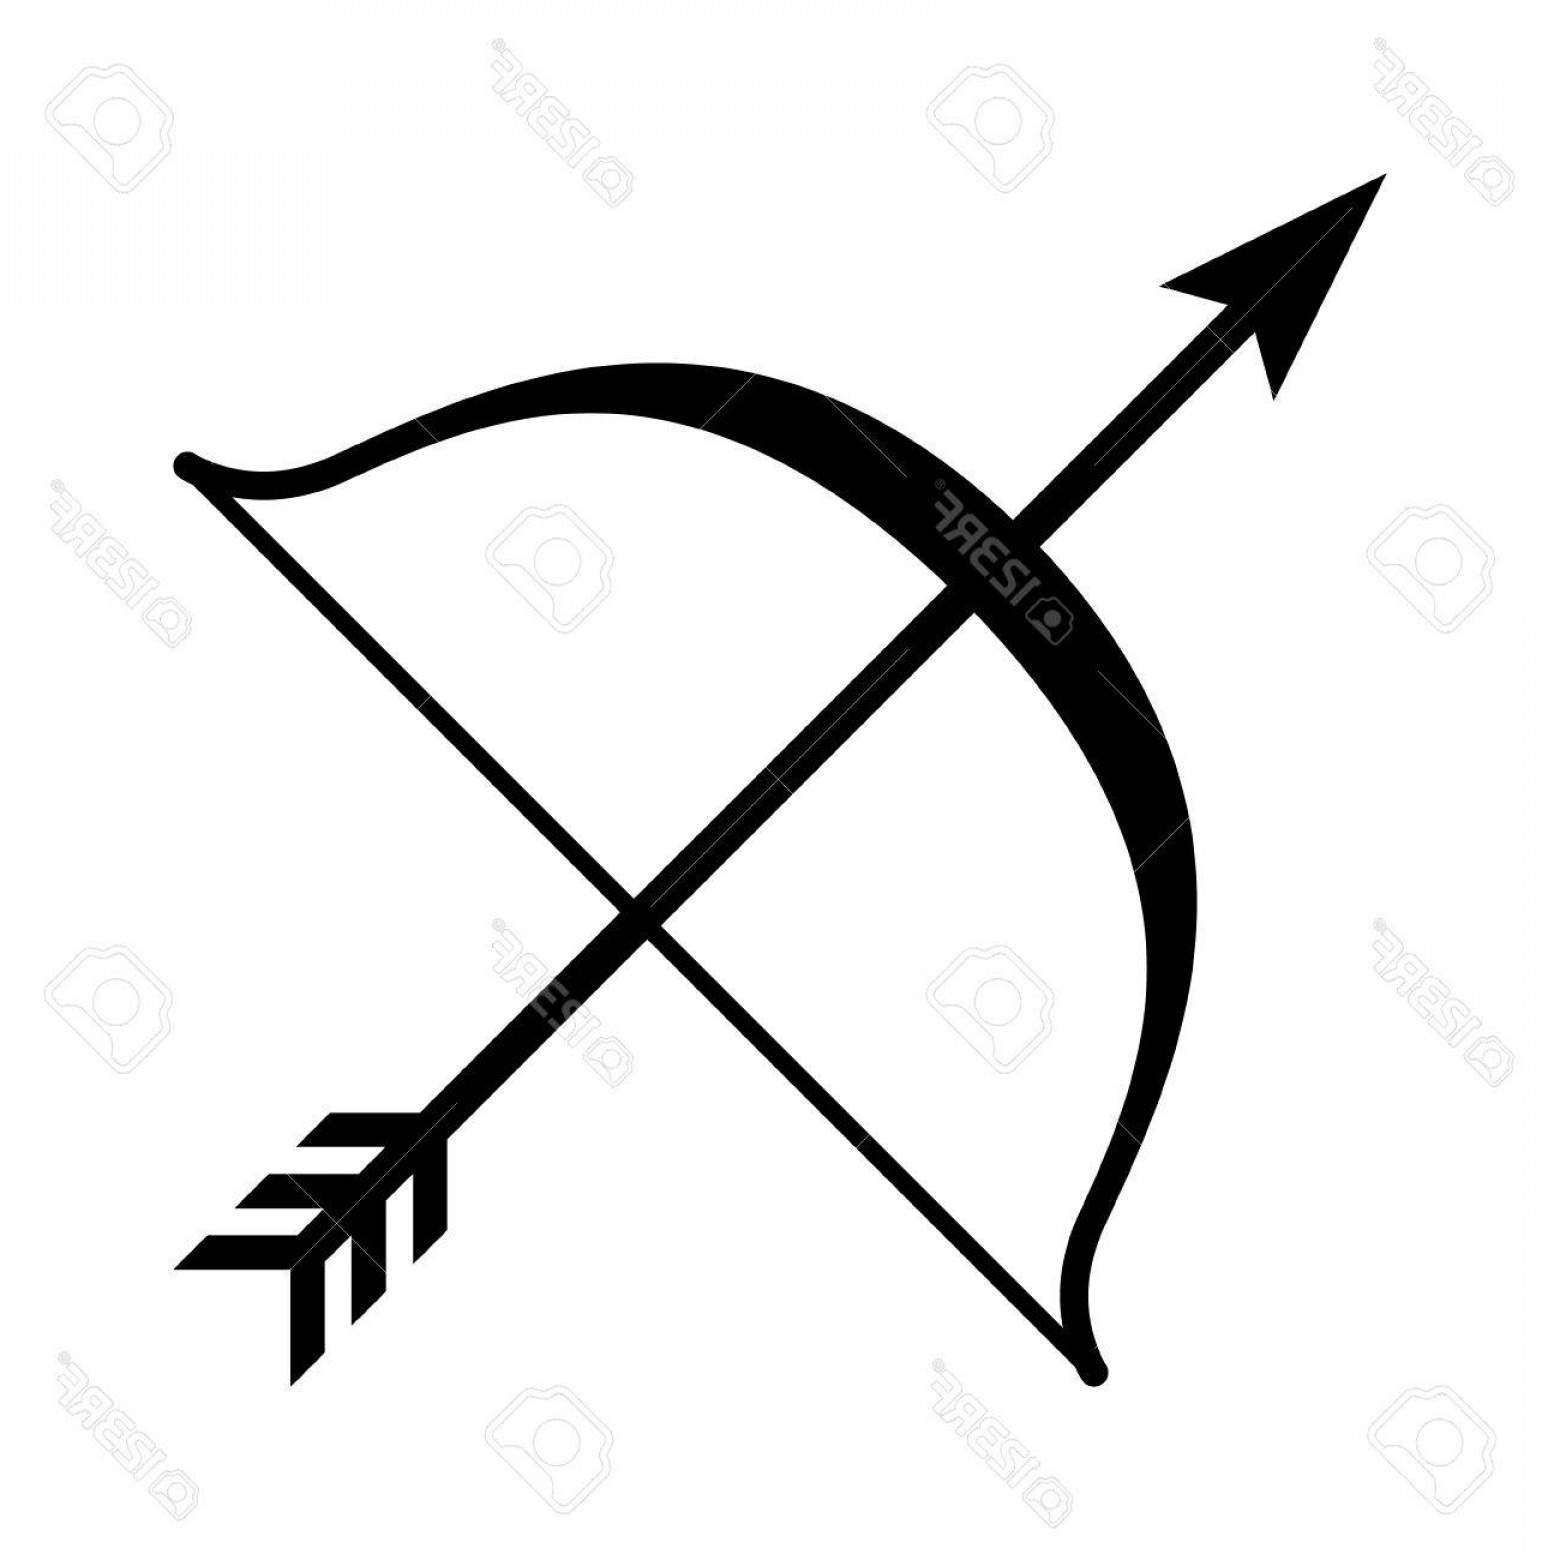 1560x1560 Photostock Vector Bow And Arrow Archery Line Art Icon For Games